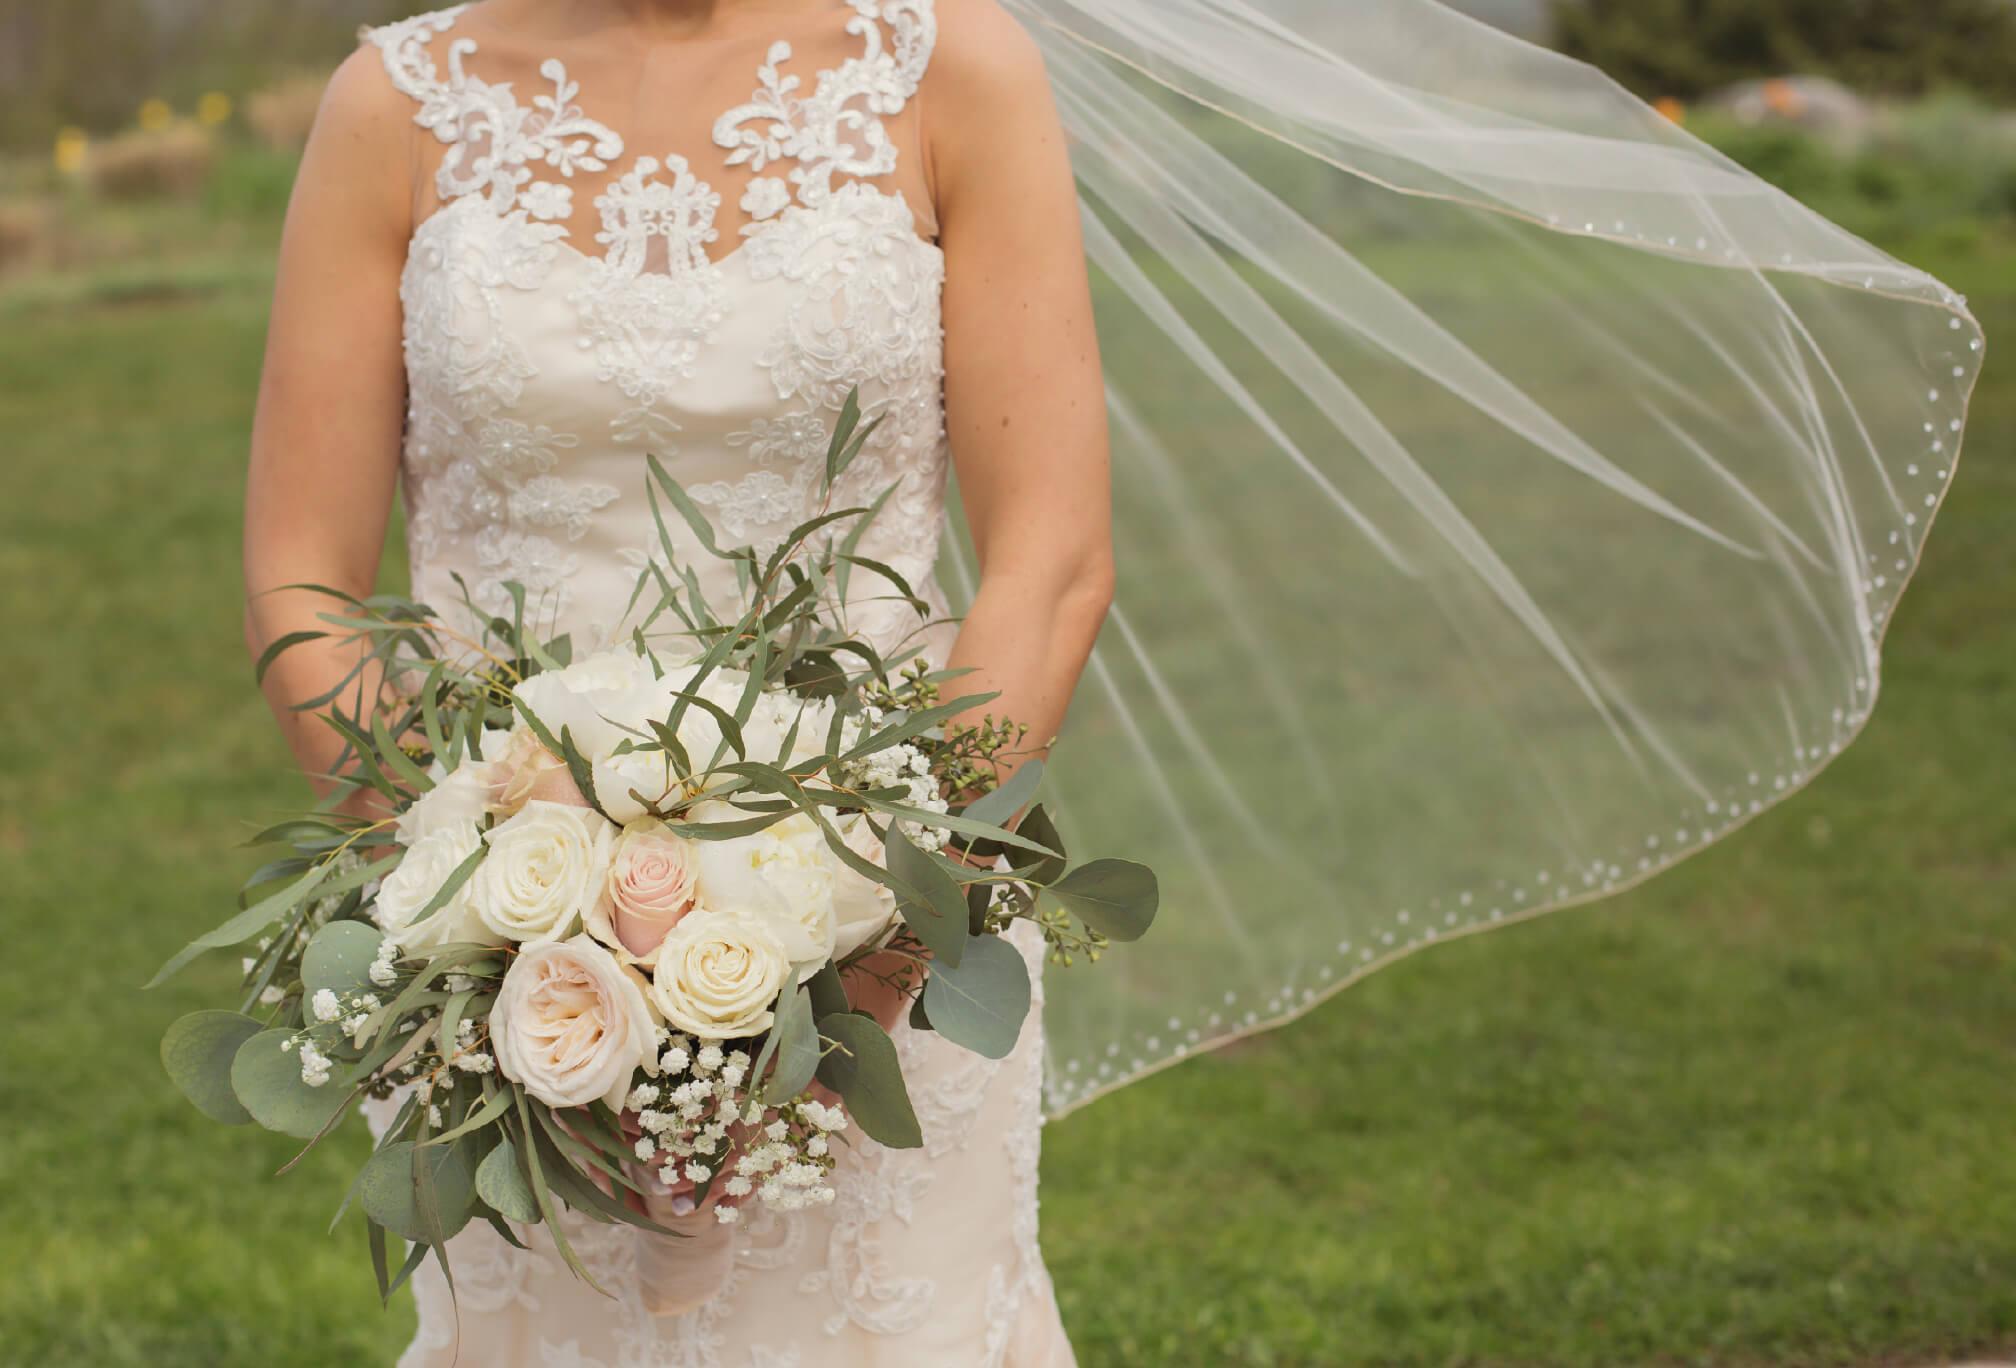 lora bay bride thornbury